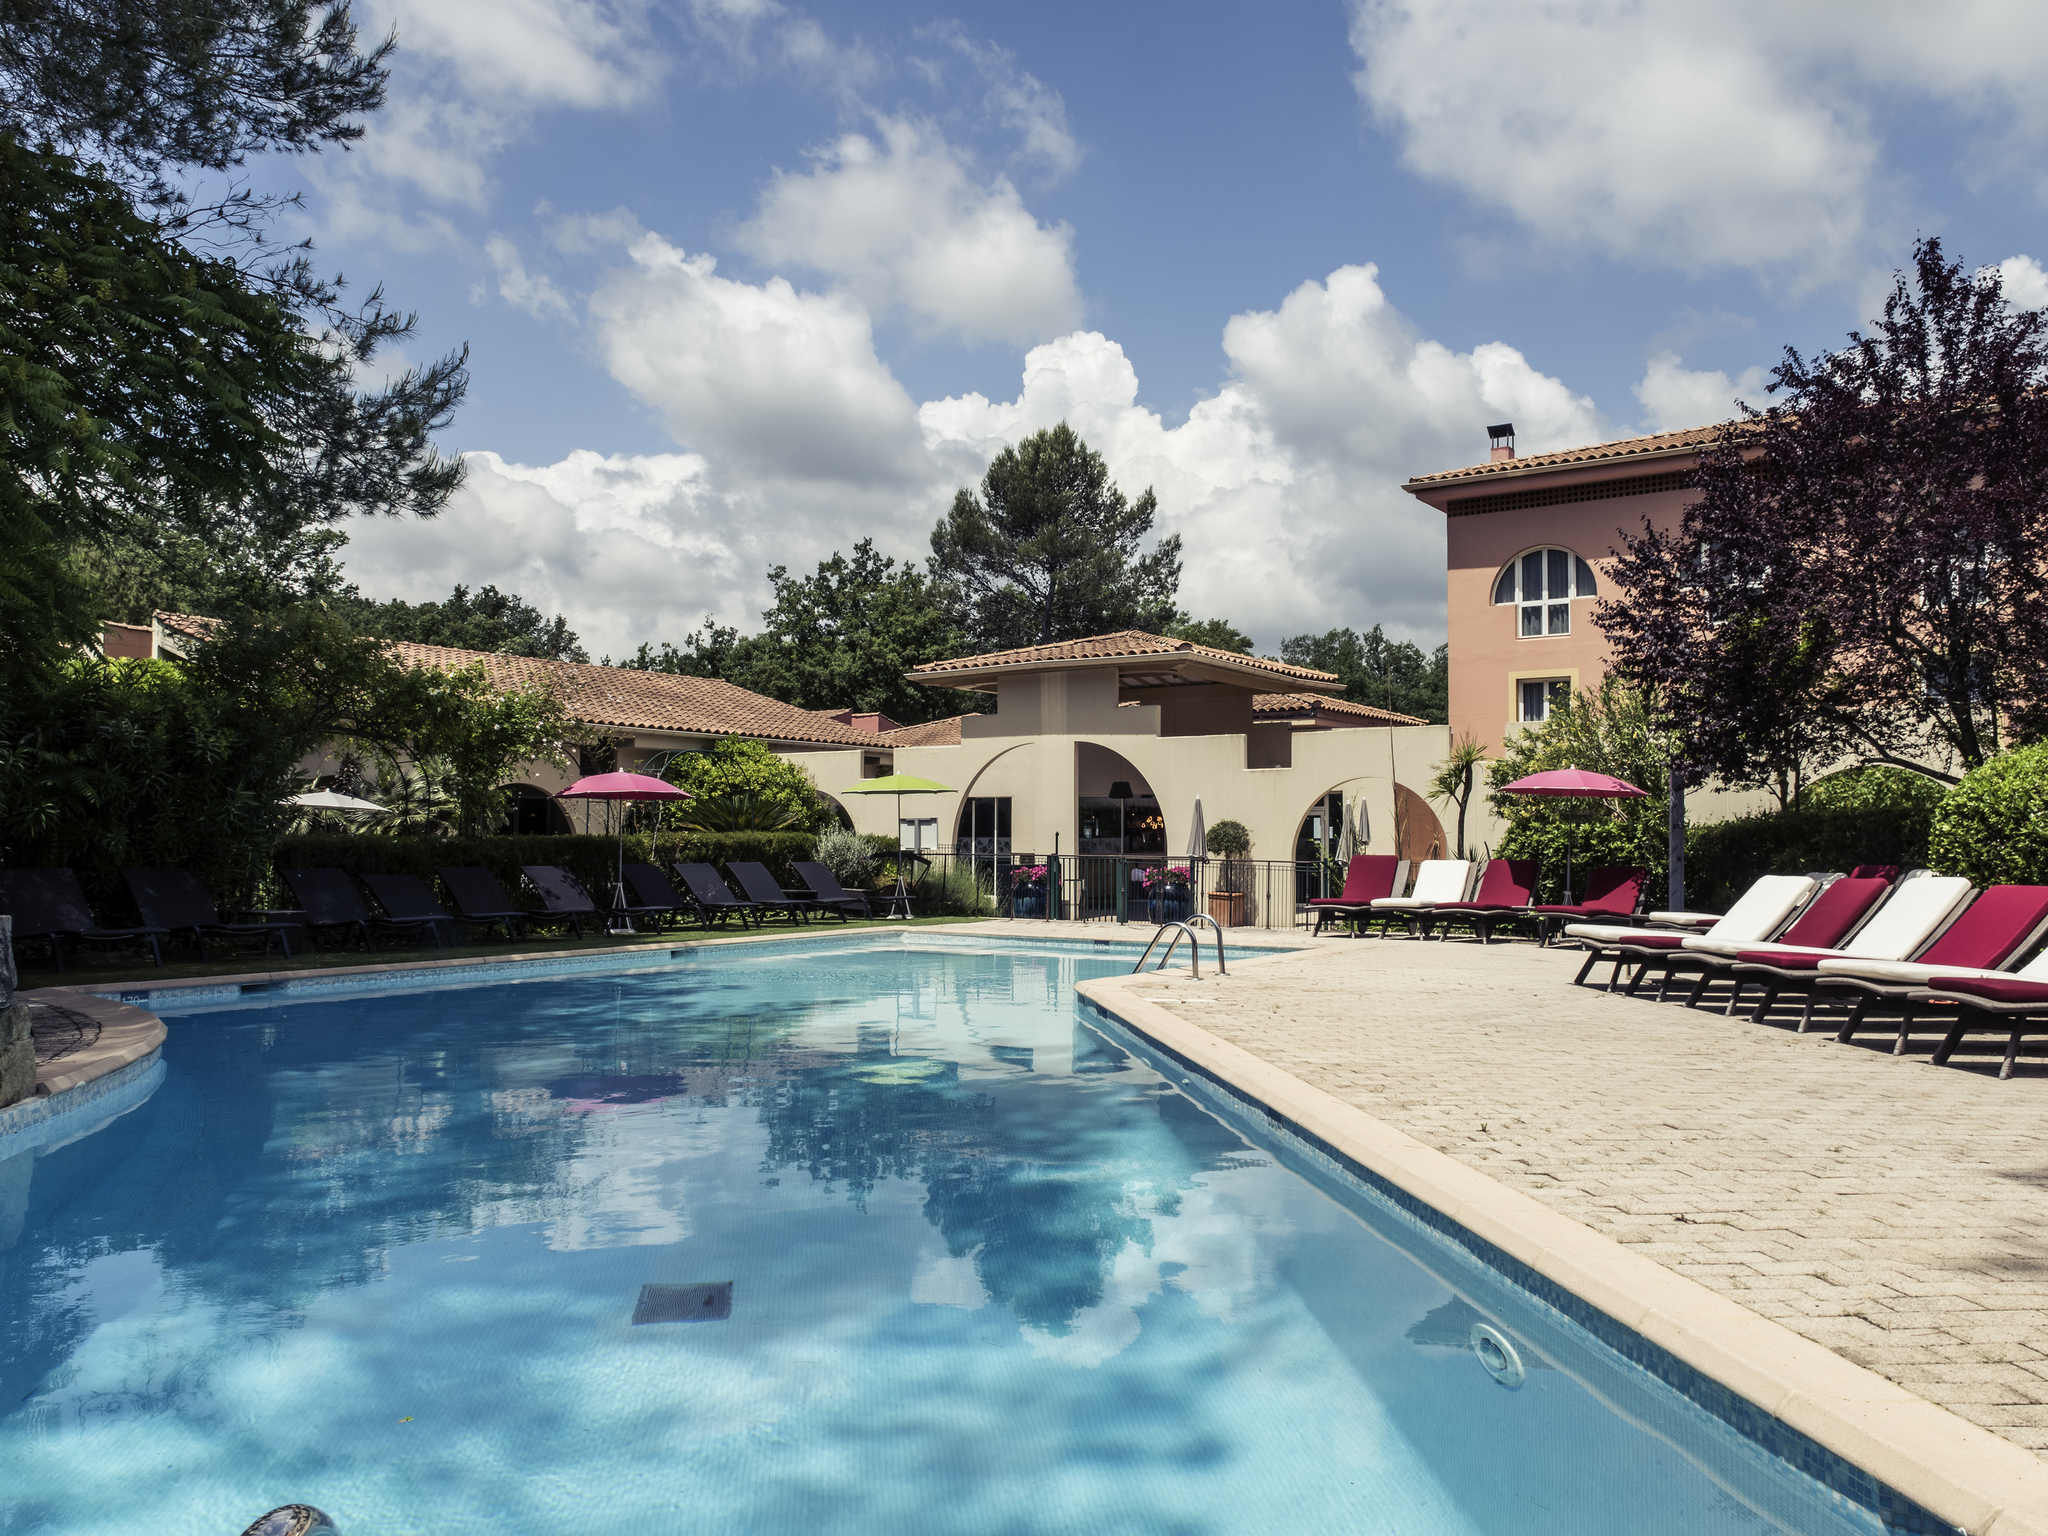 Thb Mercure Antibes Sophia Antipolis Hotel In Valbonne avec Piscine Sophia Antipolis